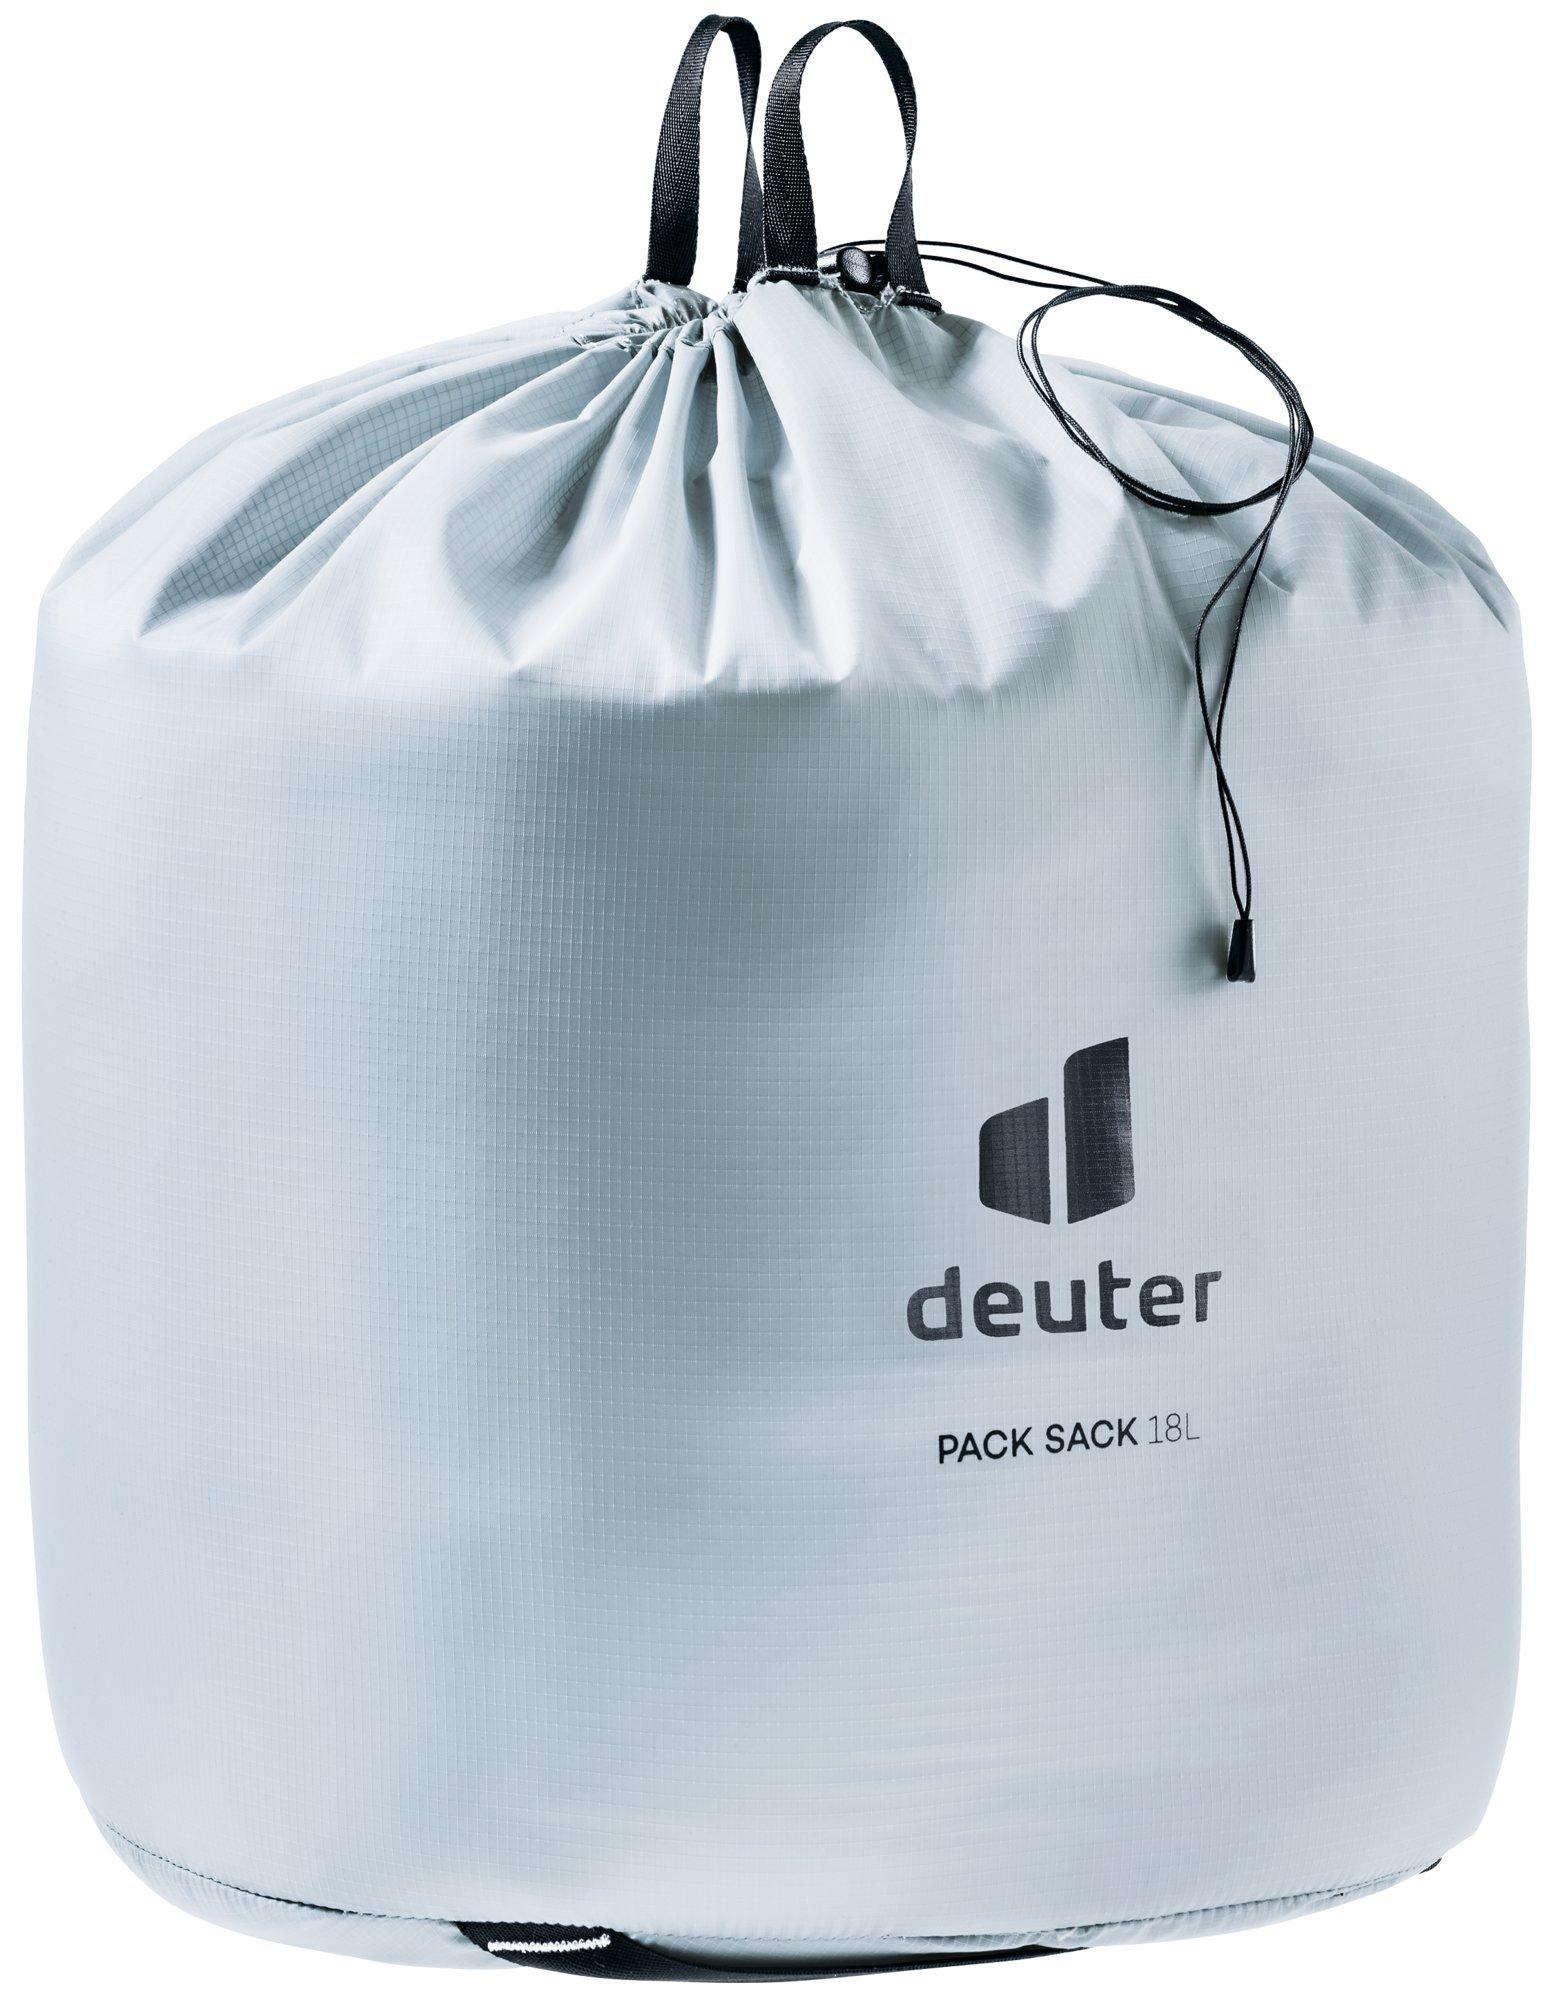 Новинки Упаковочный мешок Deuter Pack Sack 18 (2021) 3941321-4012-PackSack18-w20-d0.jpg